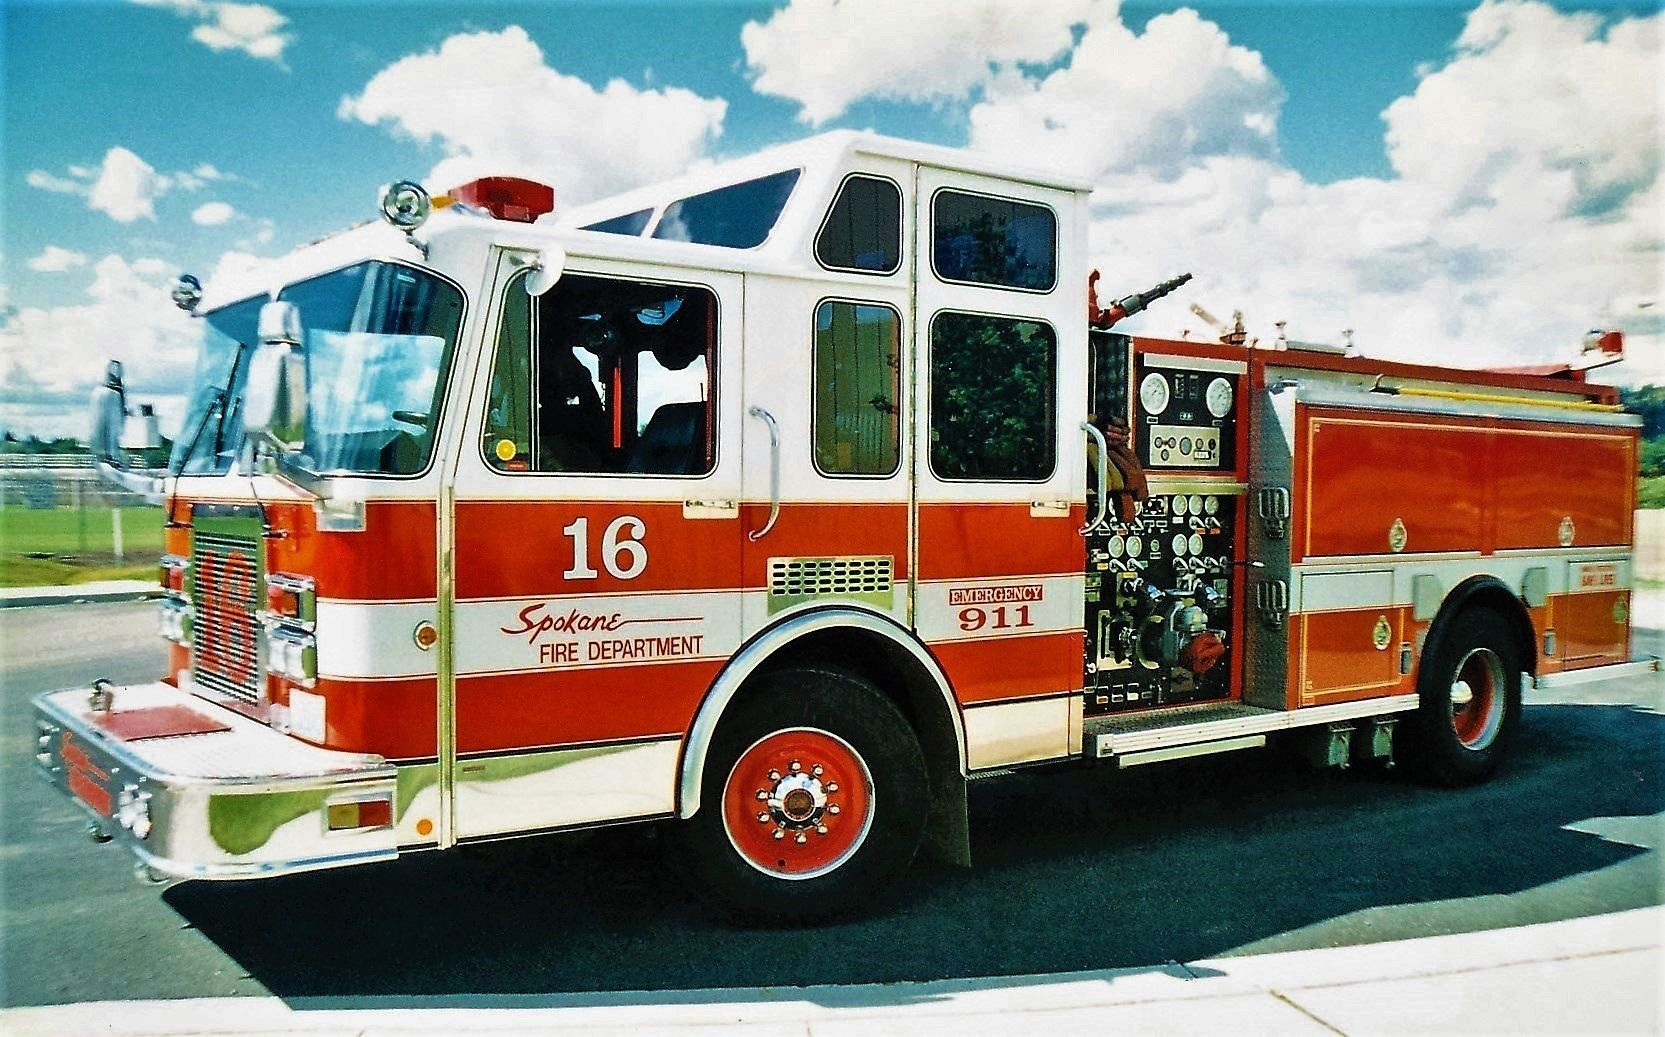 spokane fire department engine 16 1991 spartan central states 1500 500 [ 1665 x 1037 Pixel ]